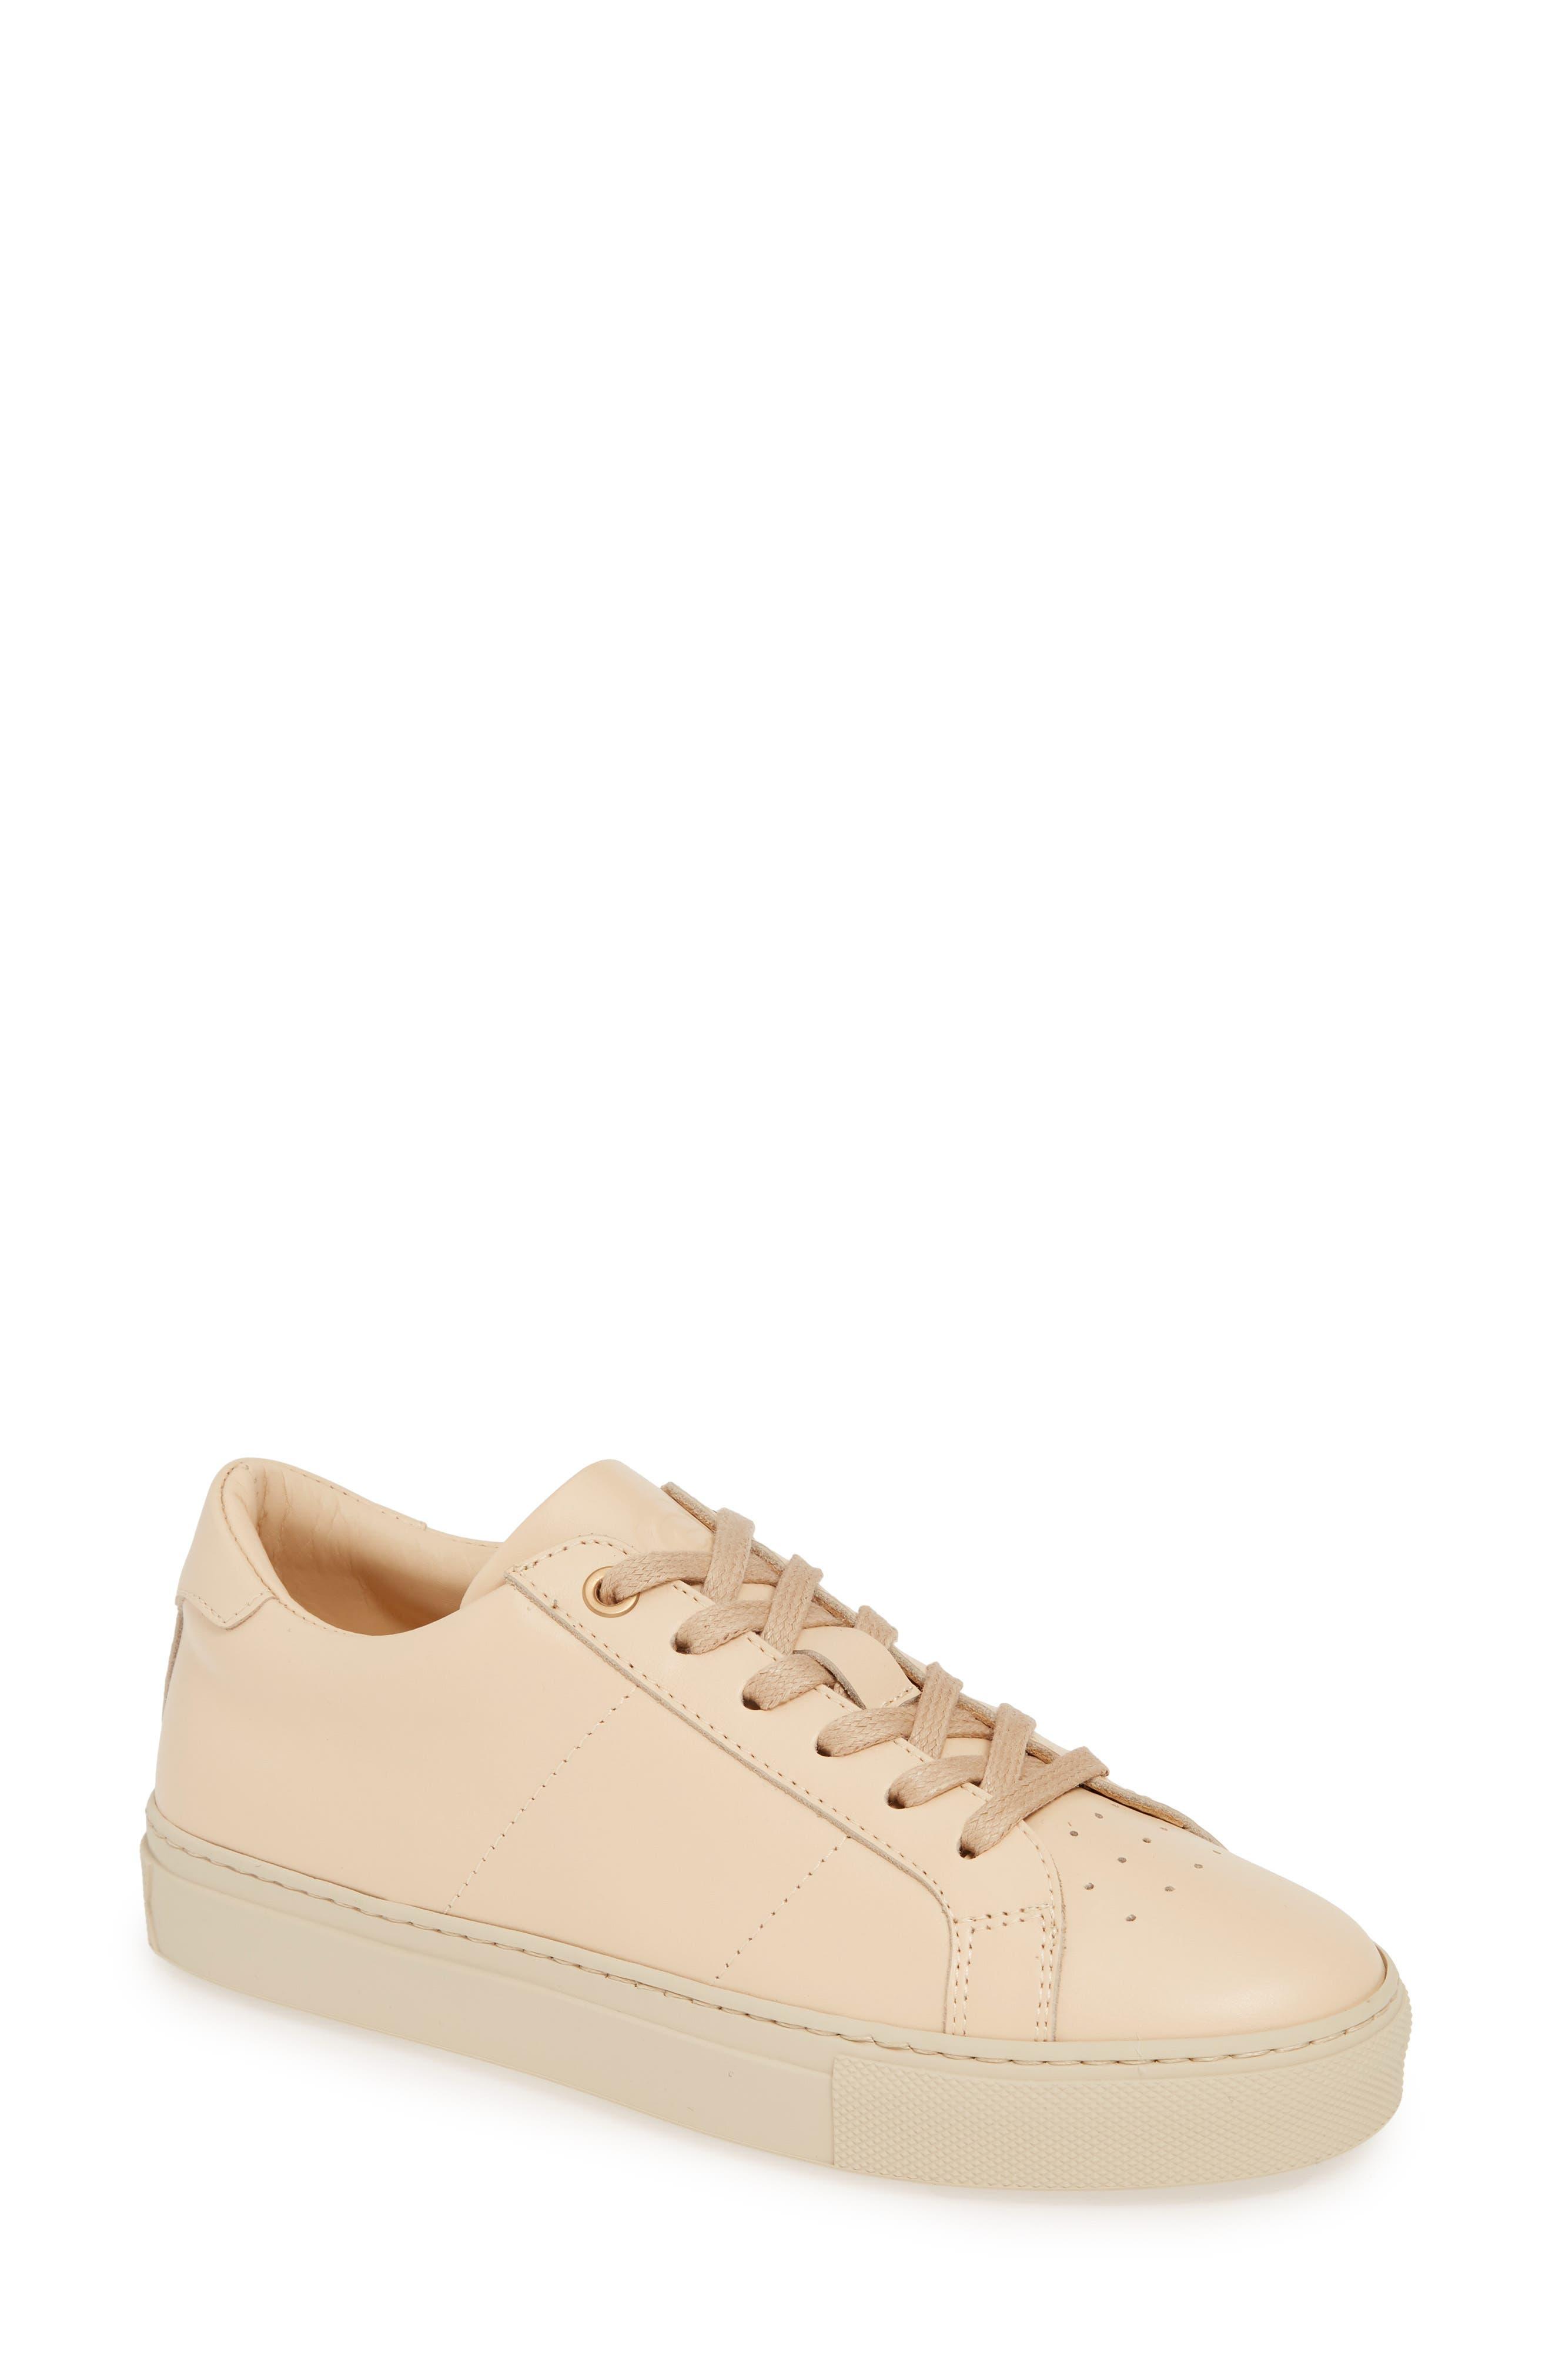 GREATS | Royale Low Top Sneaker